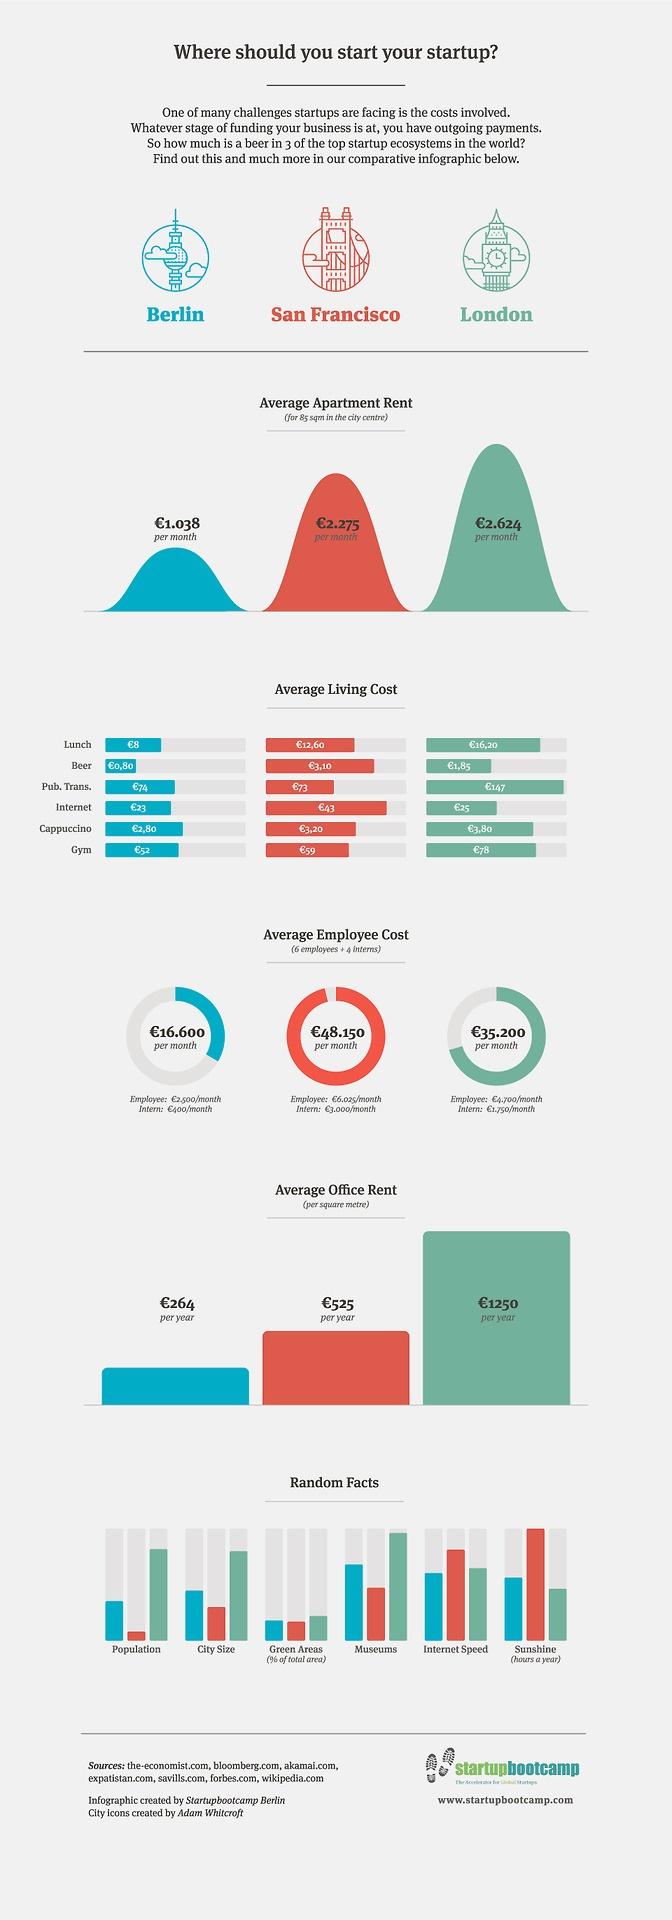 Where should you start your startup? (Berlin vs San Francisco vs London)